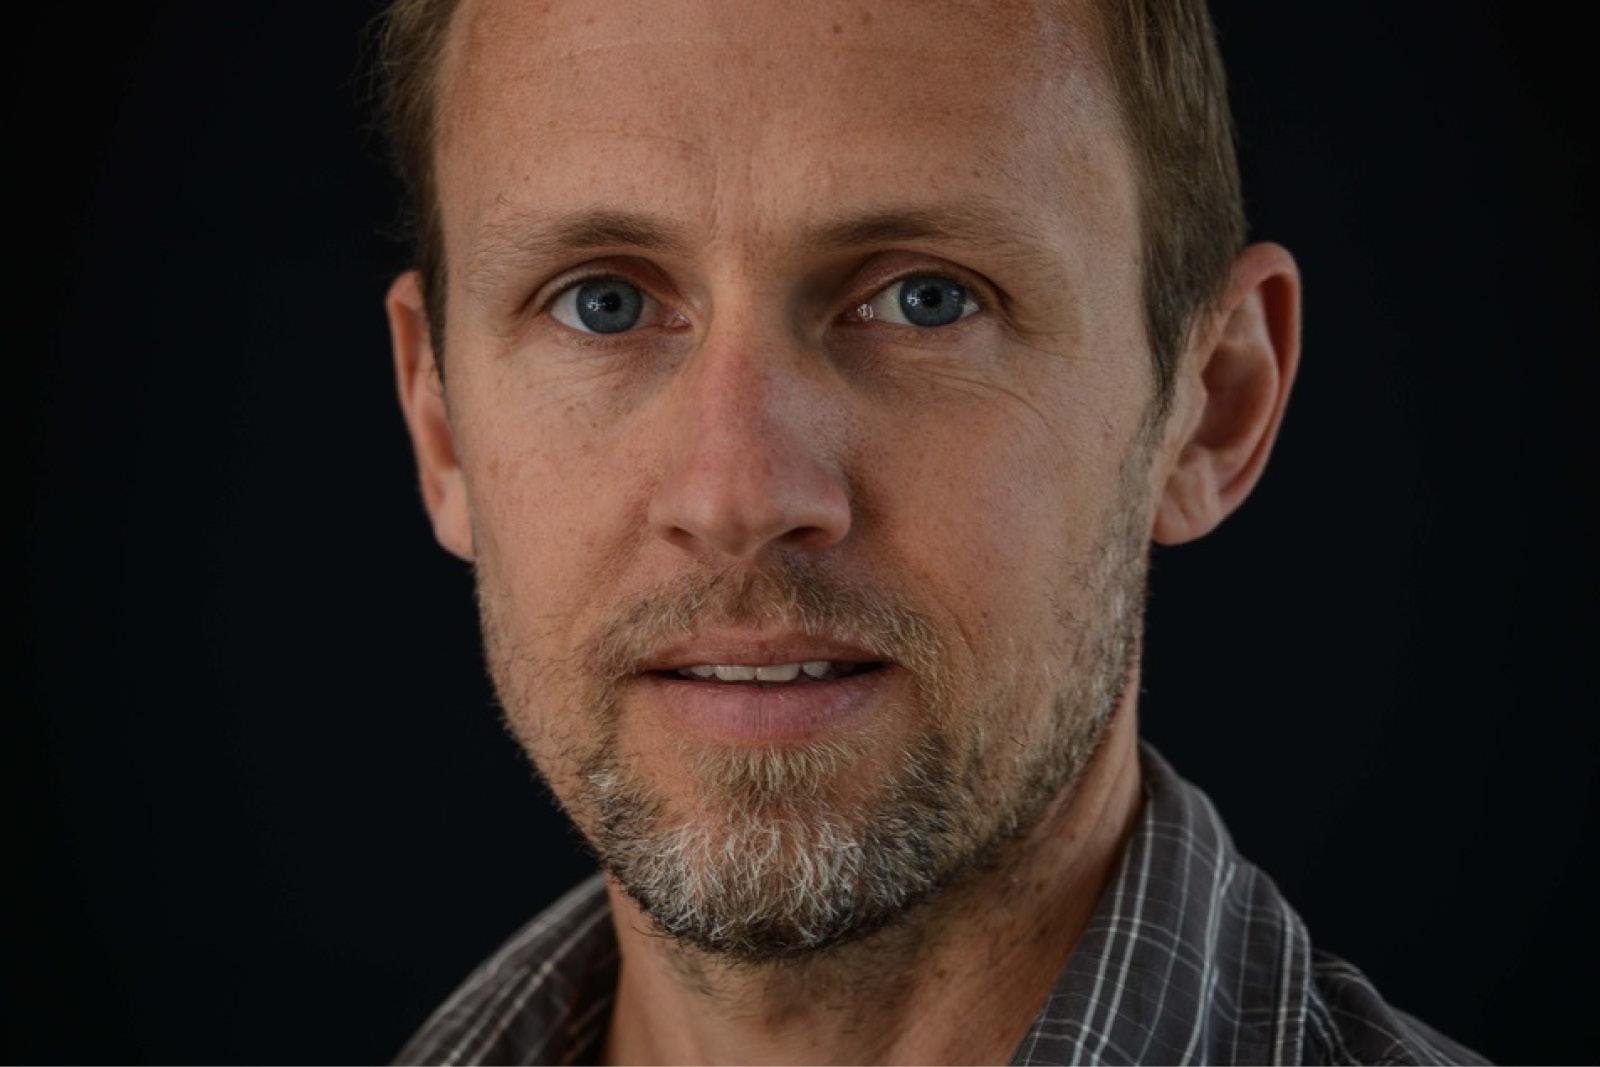 Michael Kutschbach